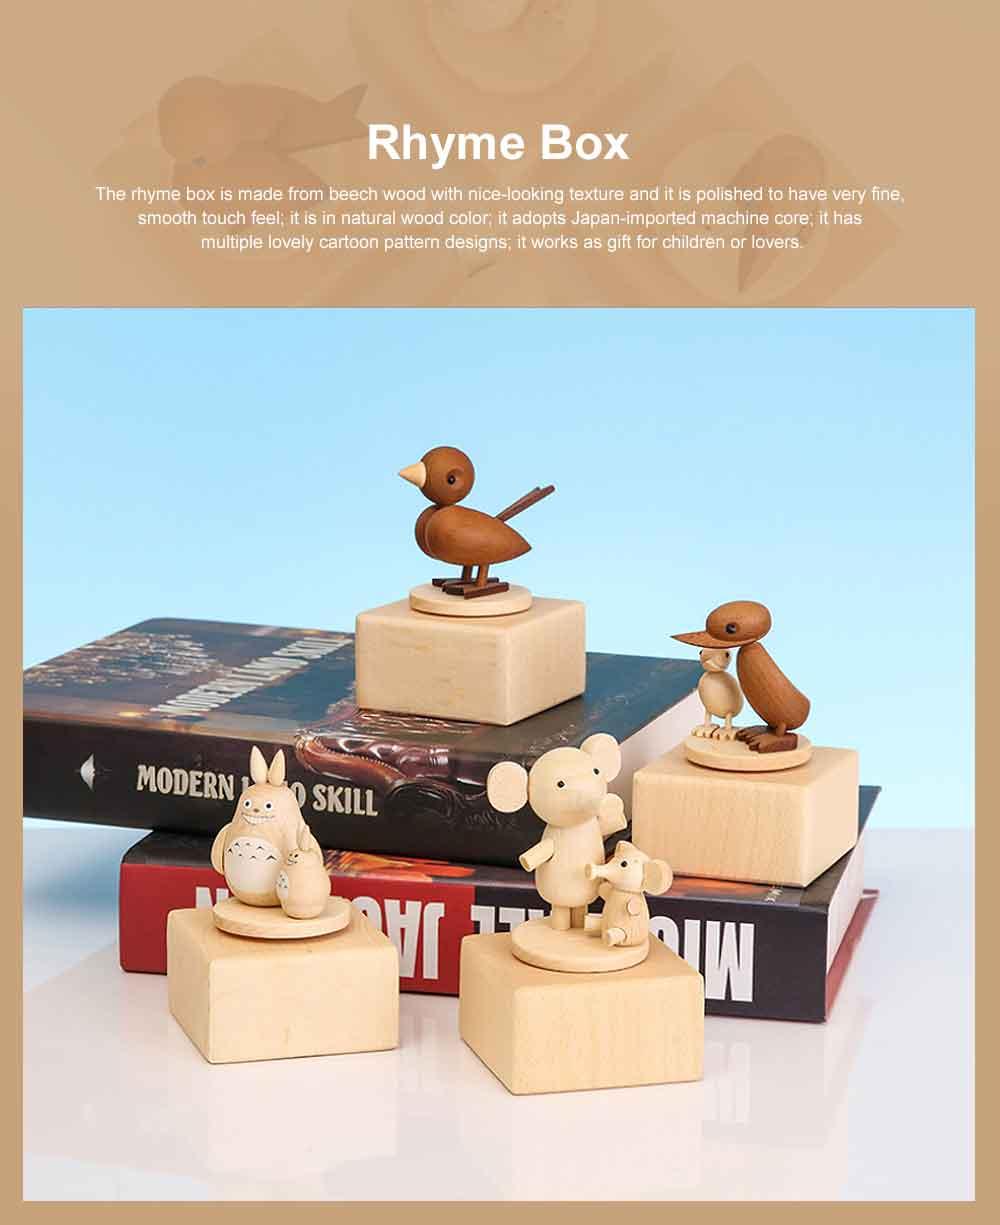 Wood Rhyme Box Mini Lovely Cartoon Design Manual Rotating Music Box Small Size Decorative Handiwork Gift for Children Family Lovers 0